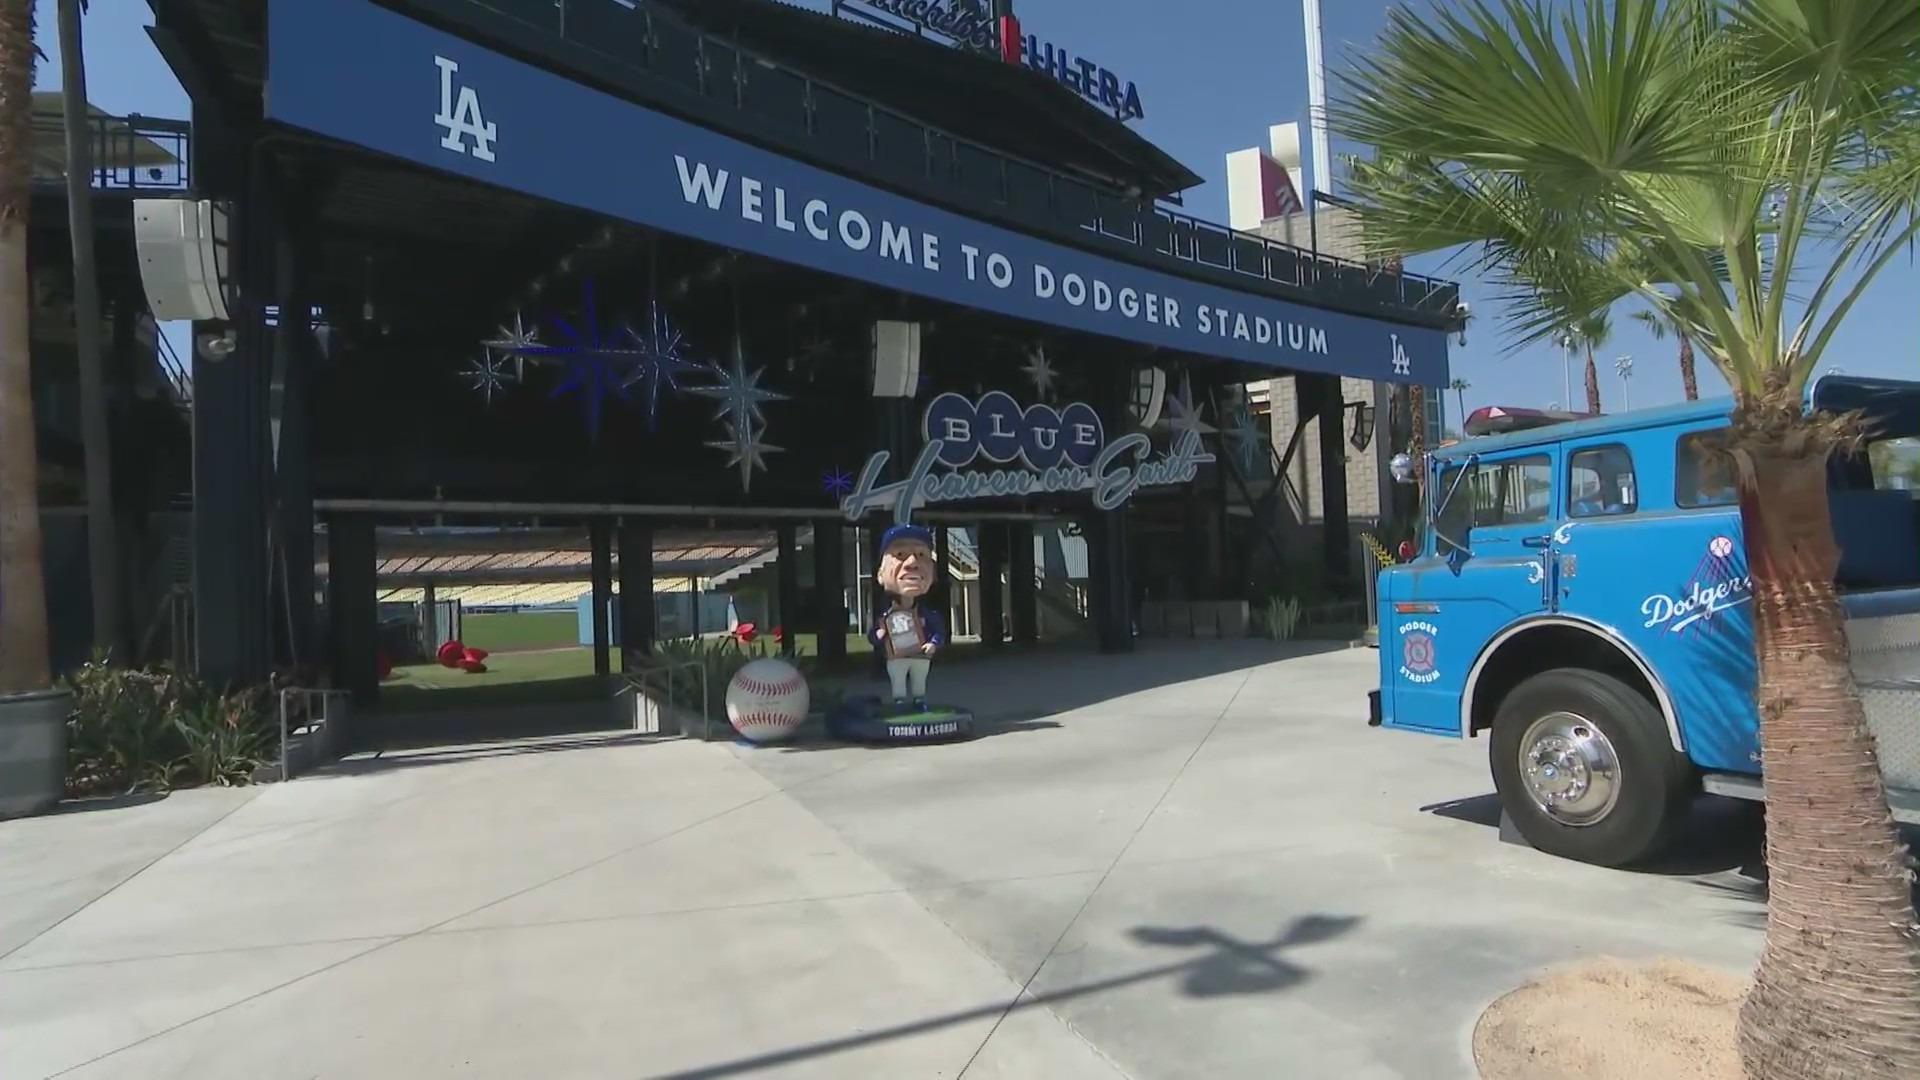 Dodger Stadium is seen on June 15, 2021. (KTLA)